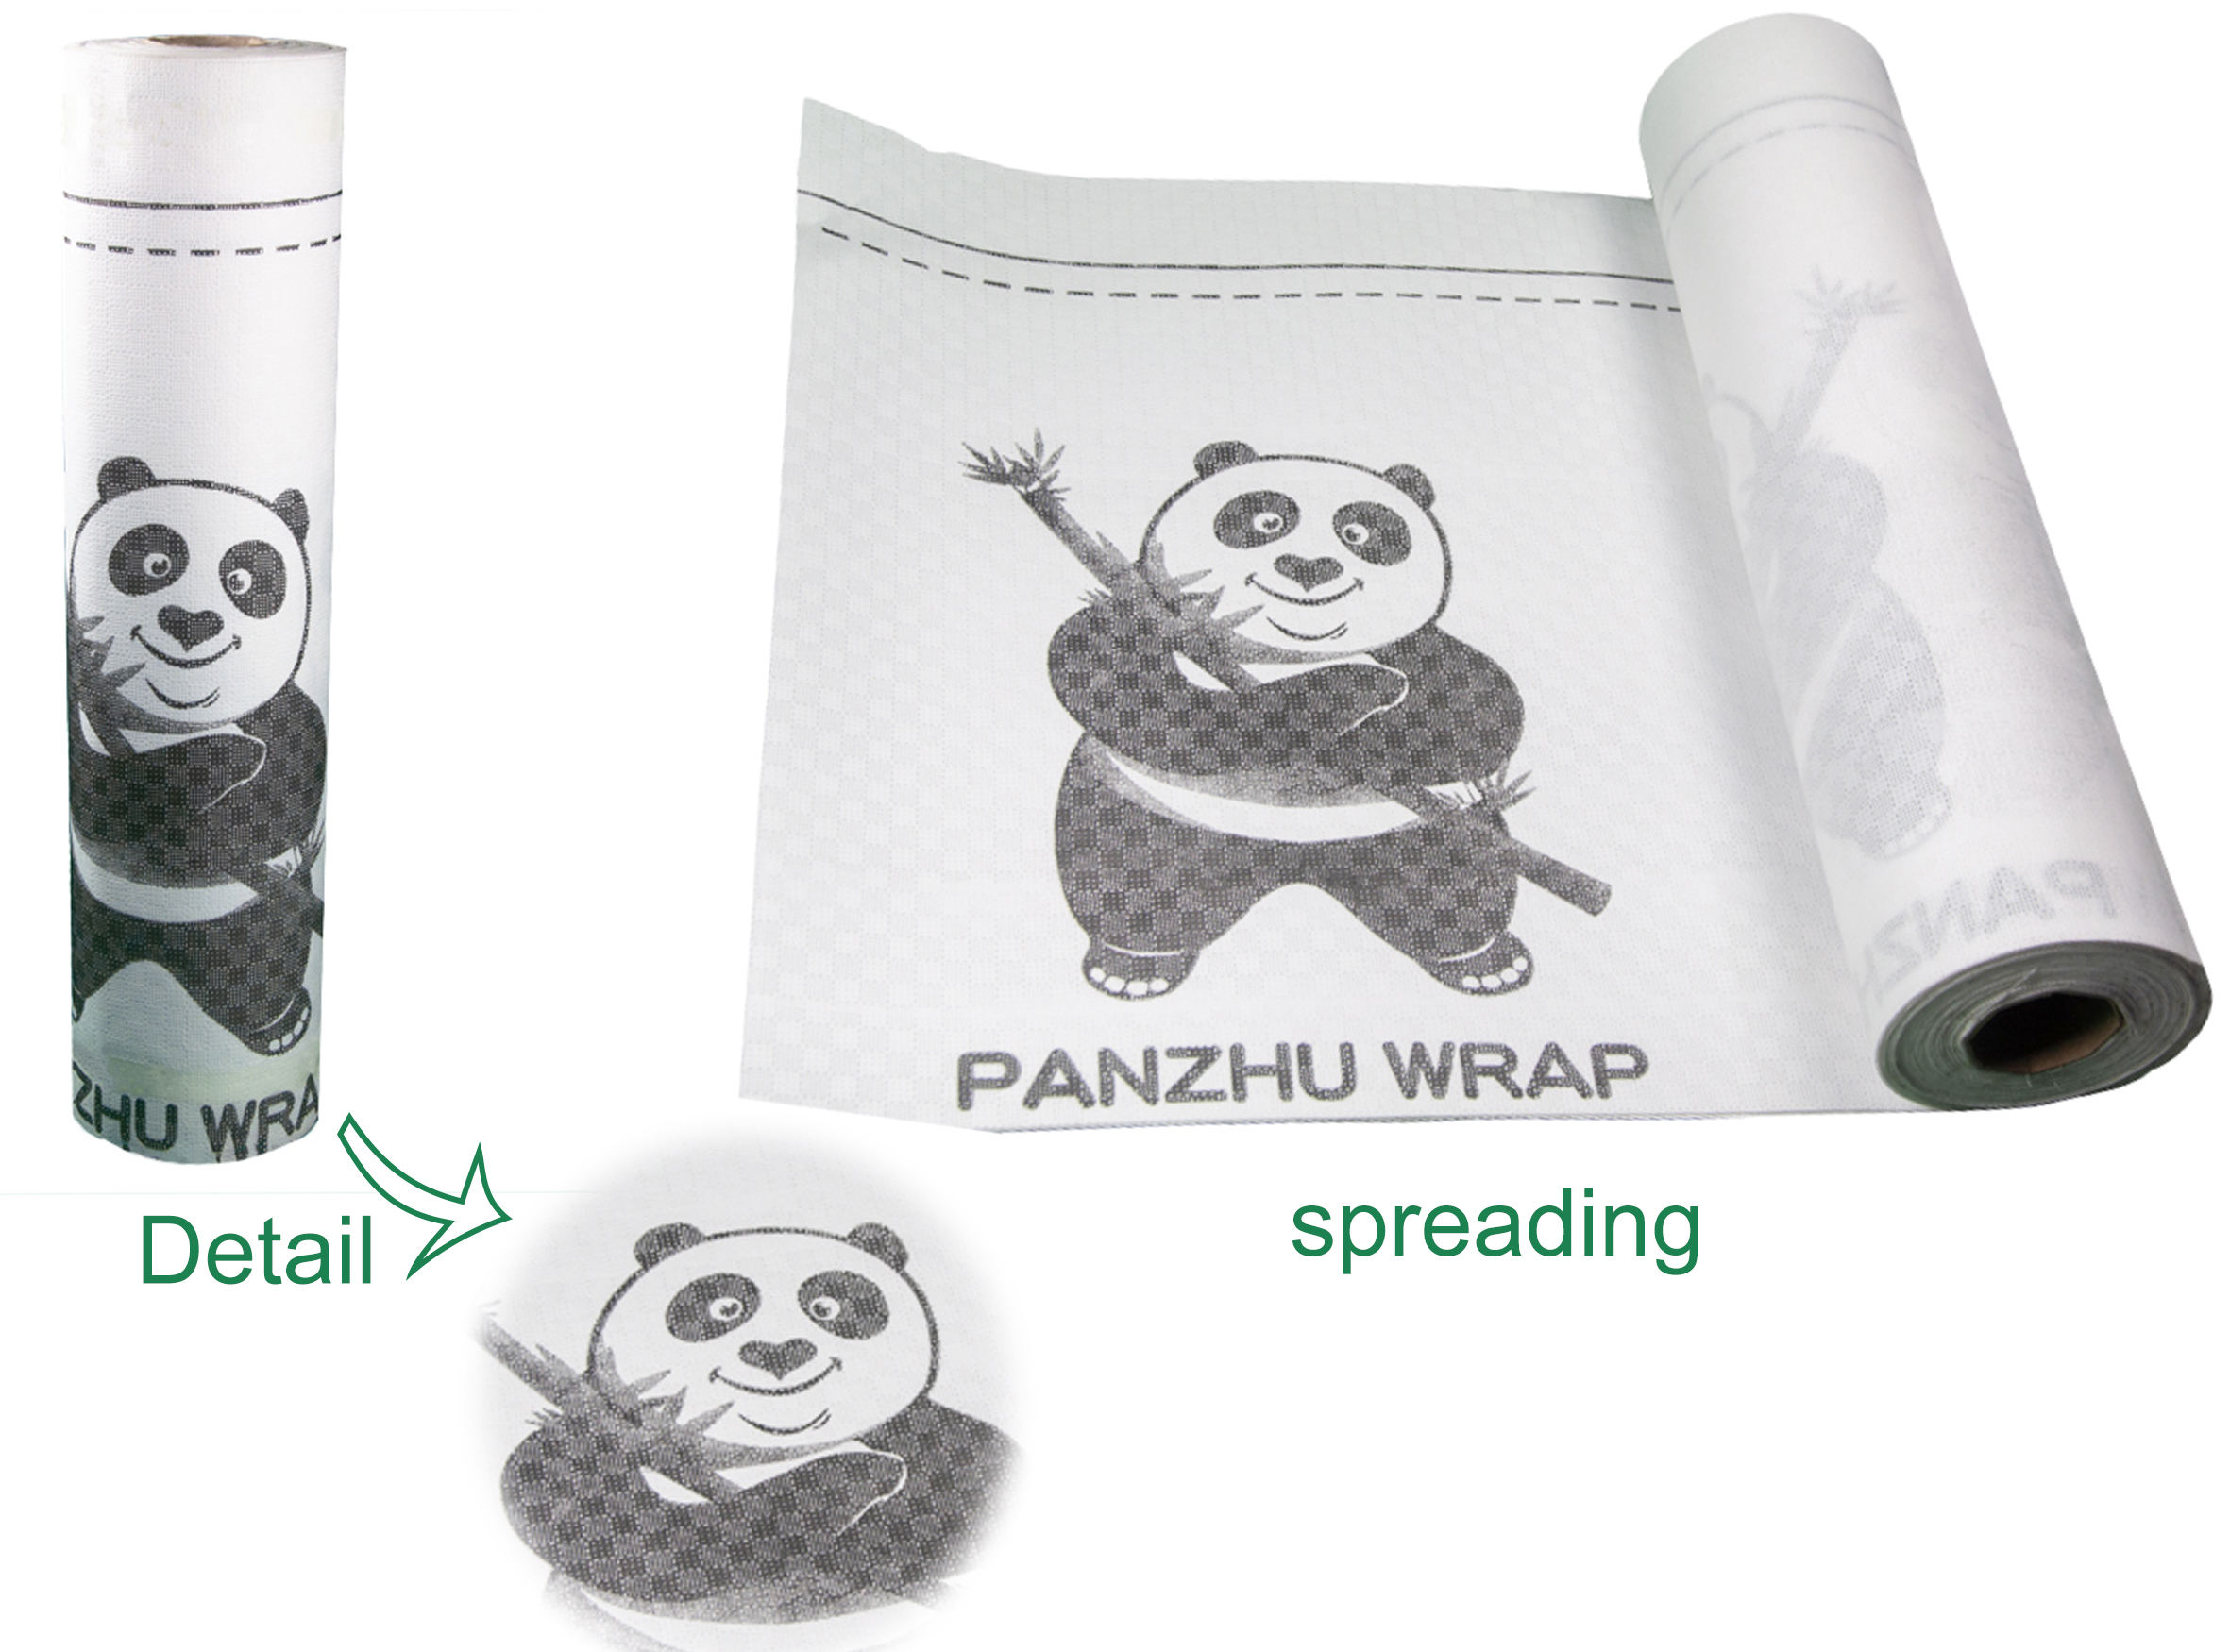 breathable menbranes